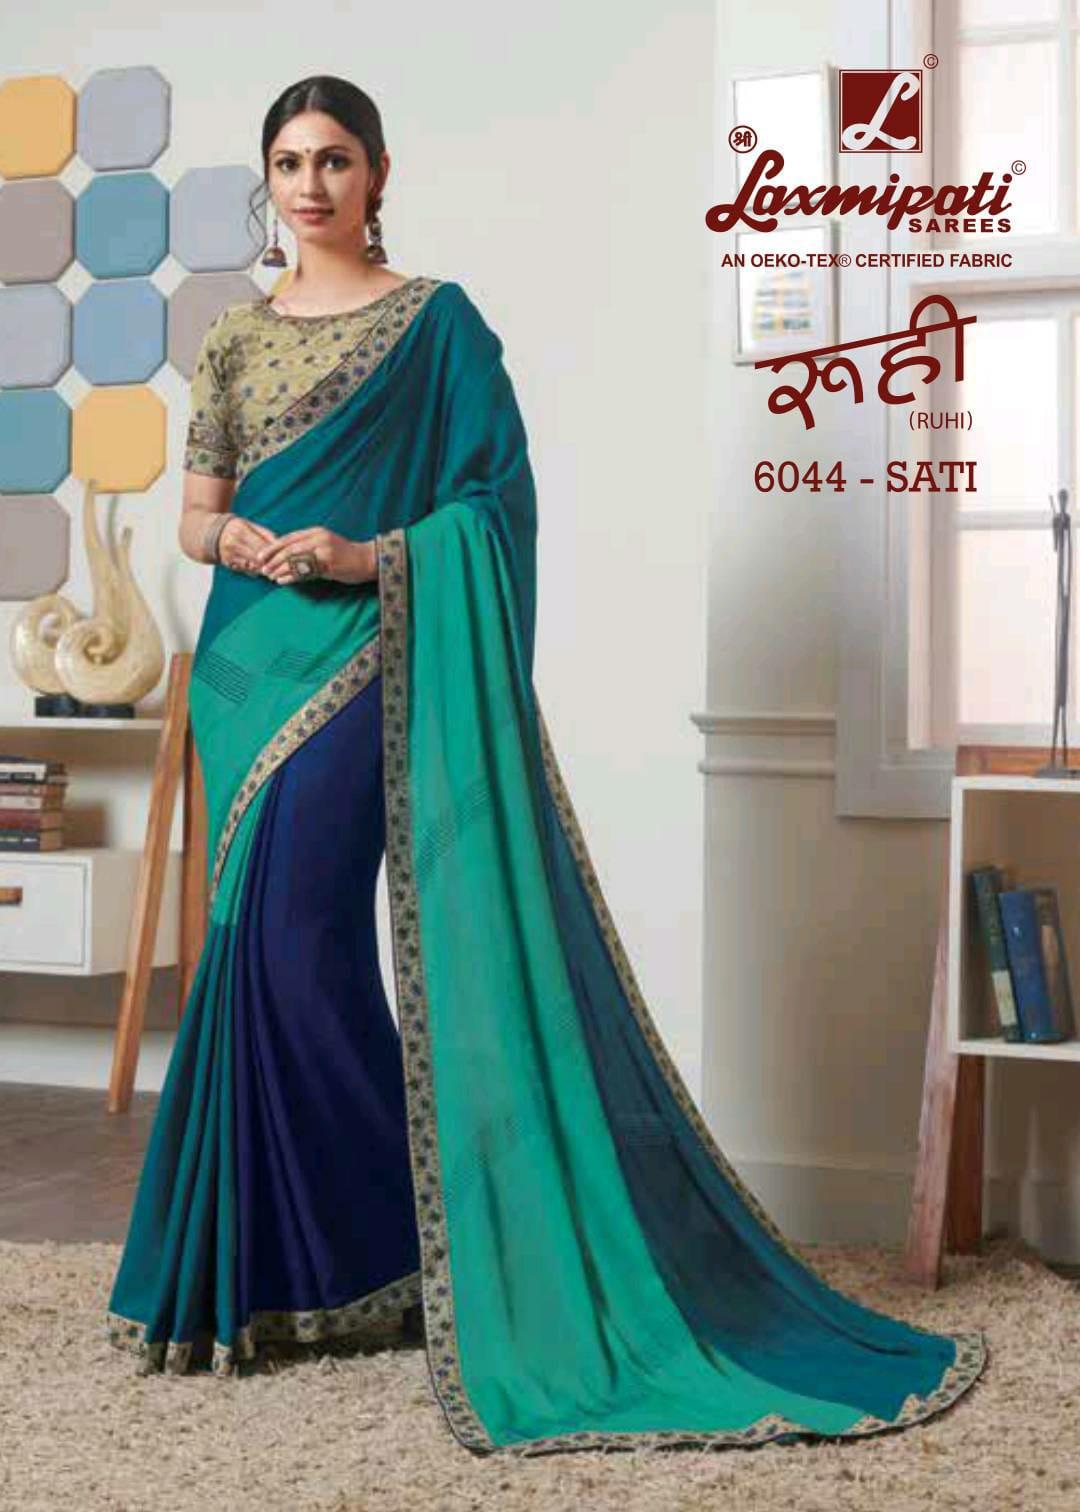 Laxmipati Saree Ruhi 6043-6053 Series Party Wear Designer Saris Supplier In Surat